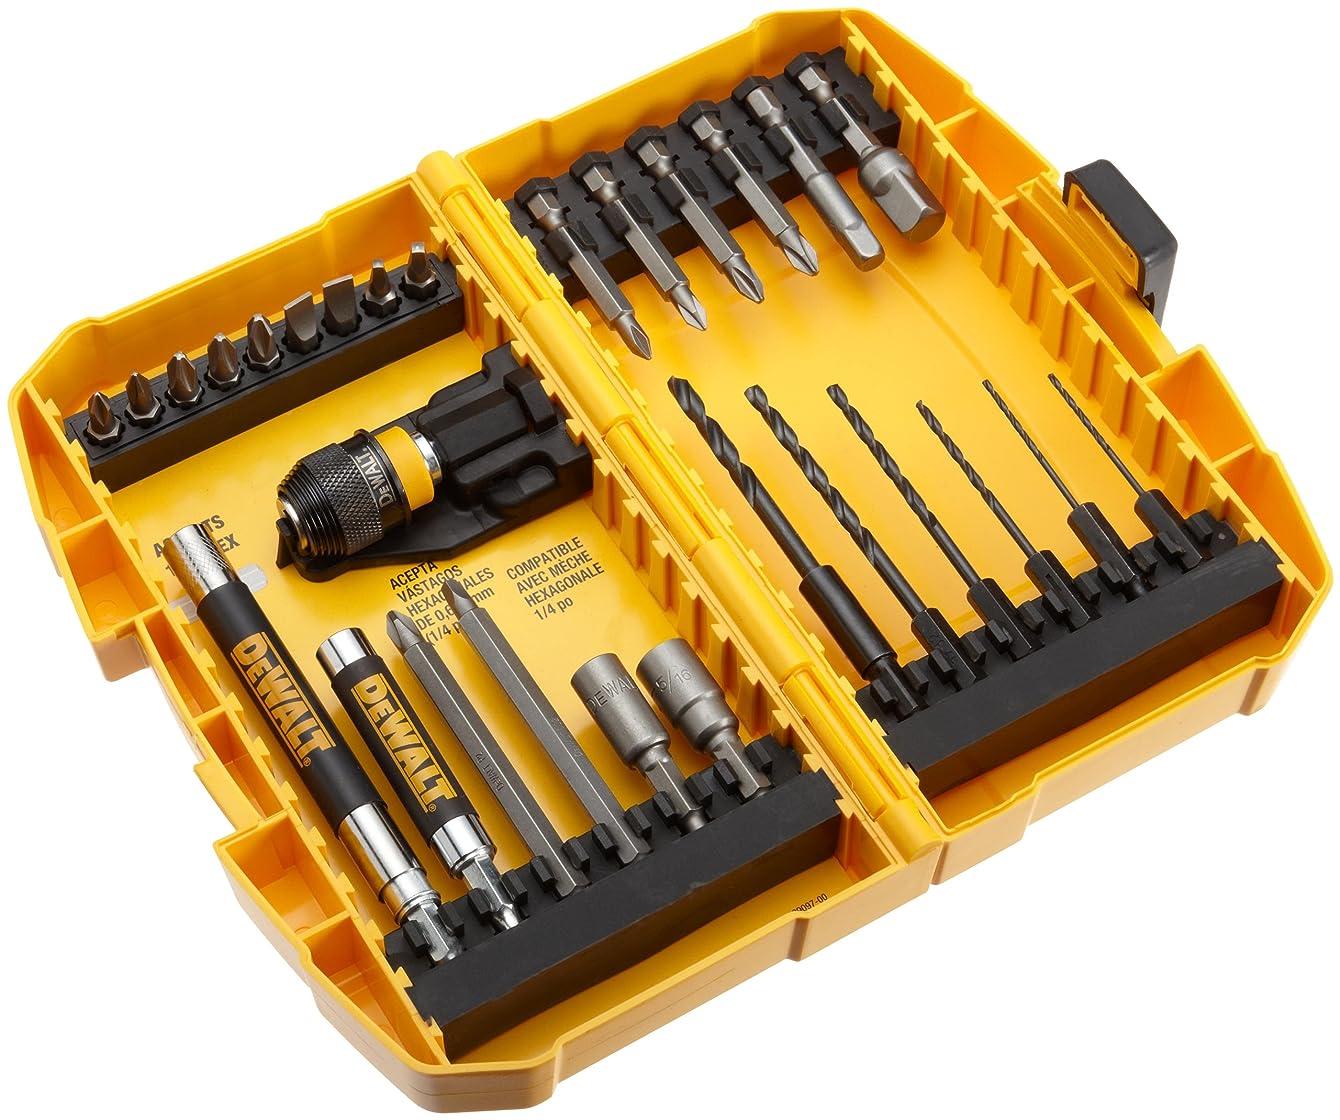 DEWALT DW2521 28-Piece Rapid Load Set